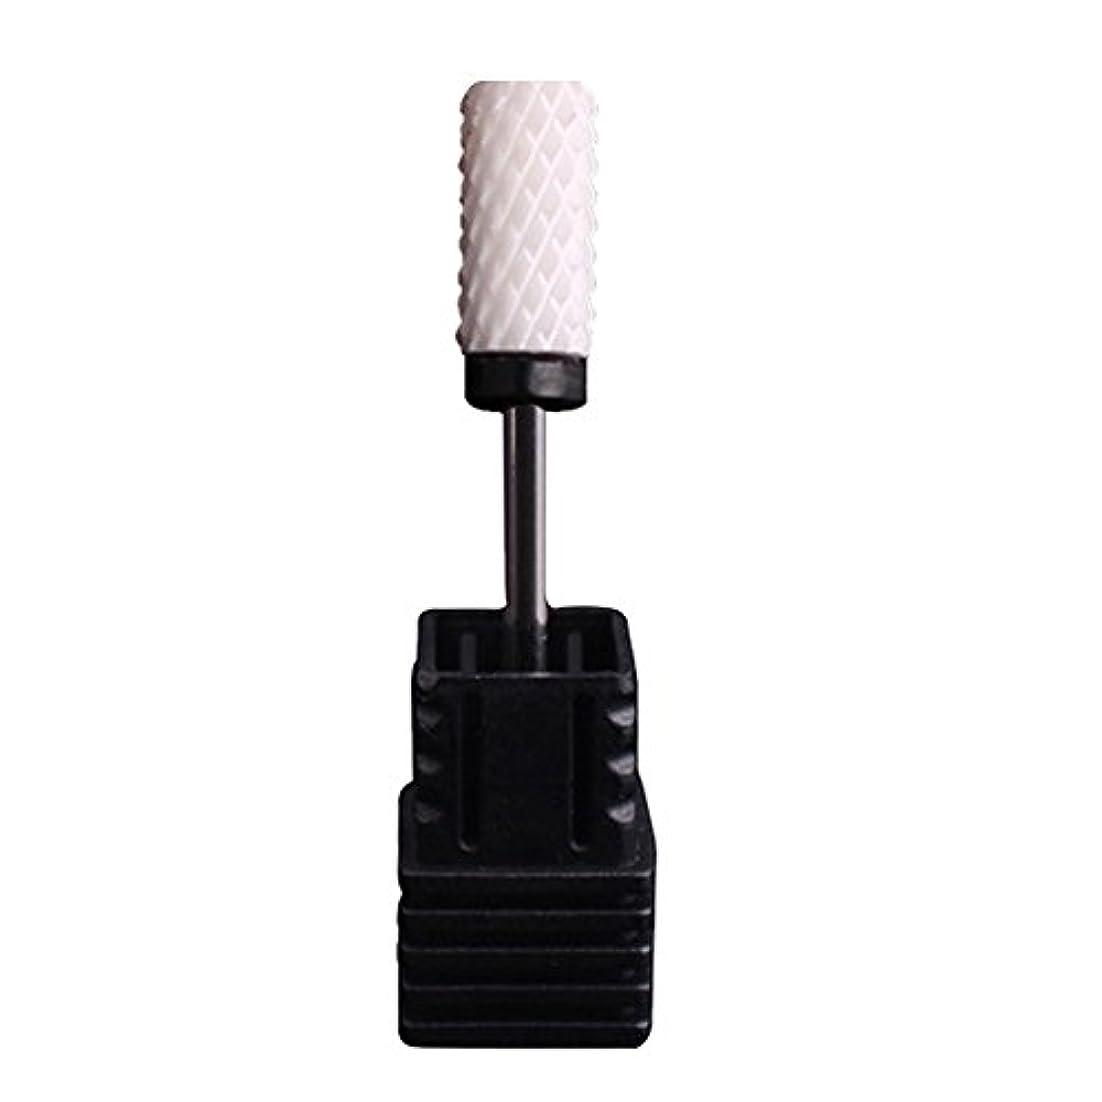 TerGOOSE 陶磁器ドリルビット ネイルマシンビット 研削ネイル ネイルドリルビット ネイルマシーン用ビット 爪ドリルビット 交換用品 耐摩耗性 耐腐食性 高硬度 硬質セラミックドリルビット(XC)